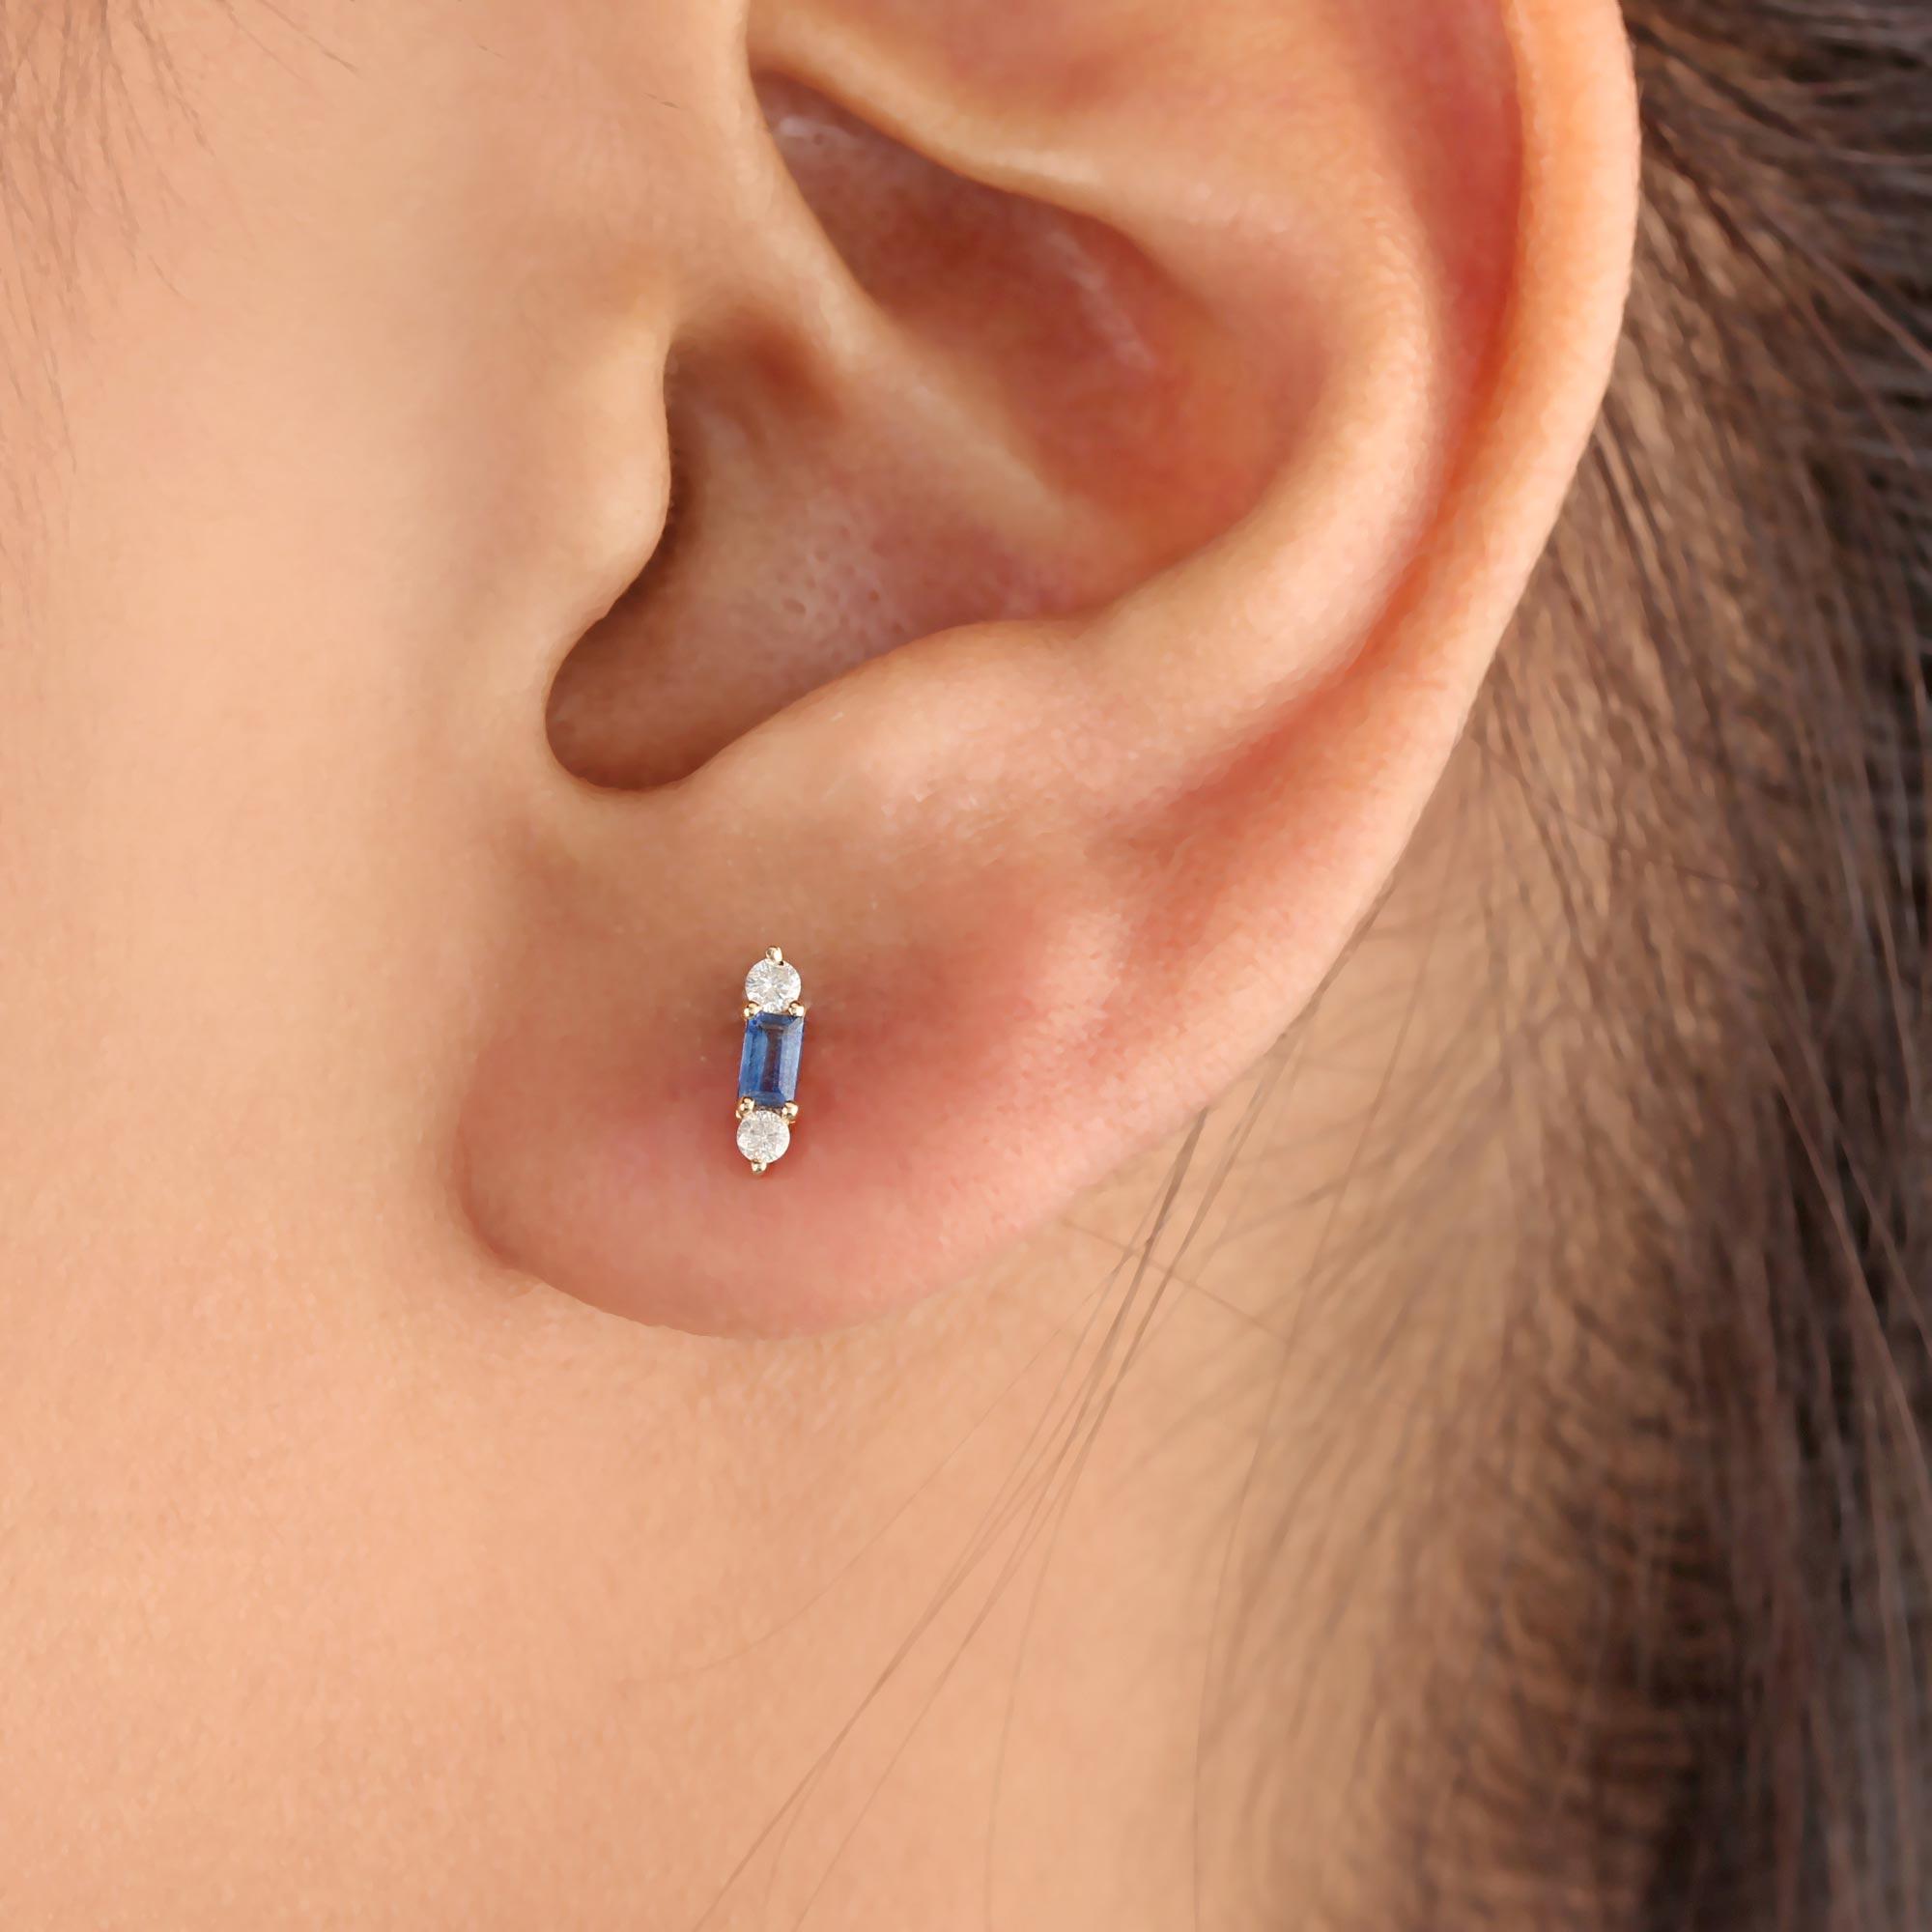 Blue Sapphire Gemstone 14K Solid Gold Stud Earrings Natural Diamond Jewelry